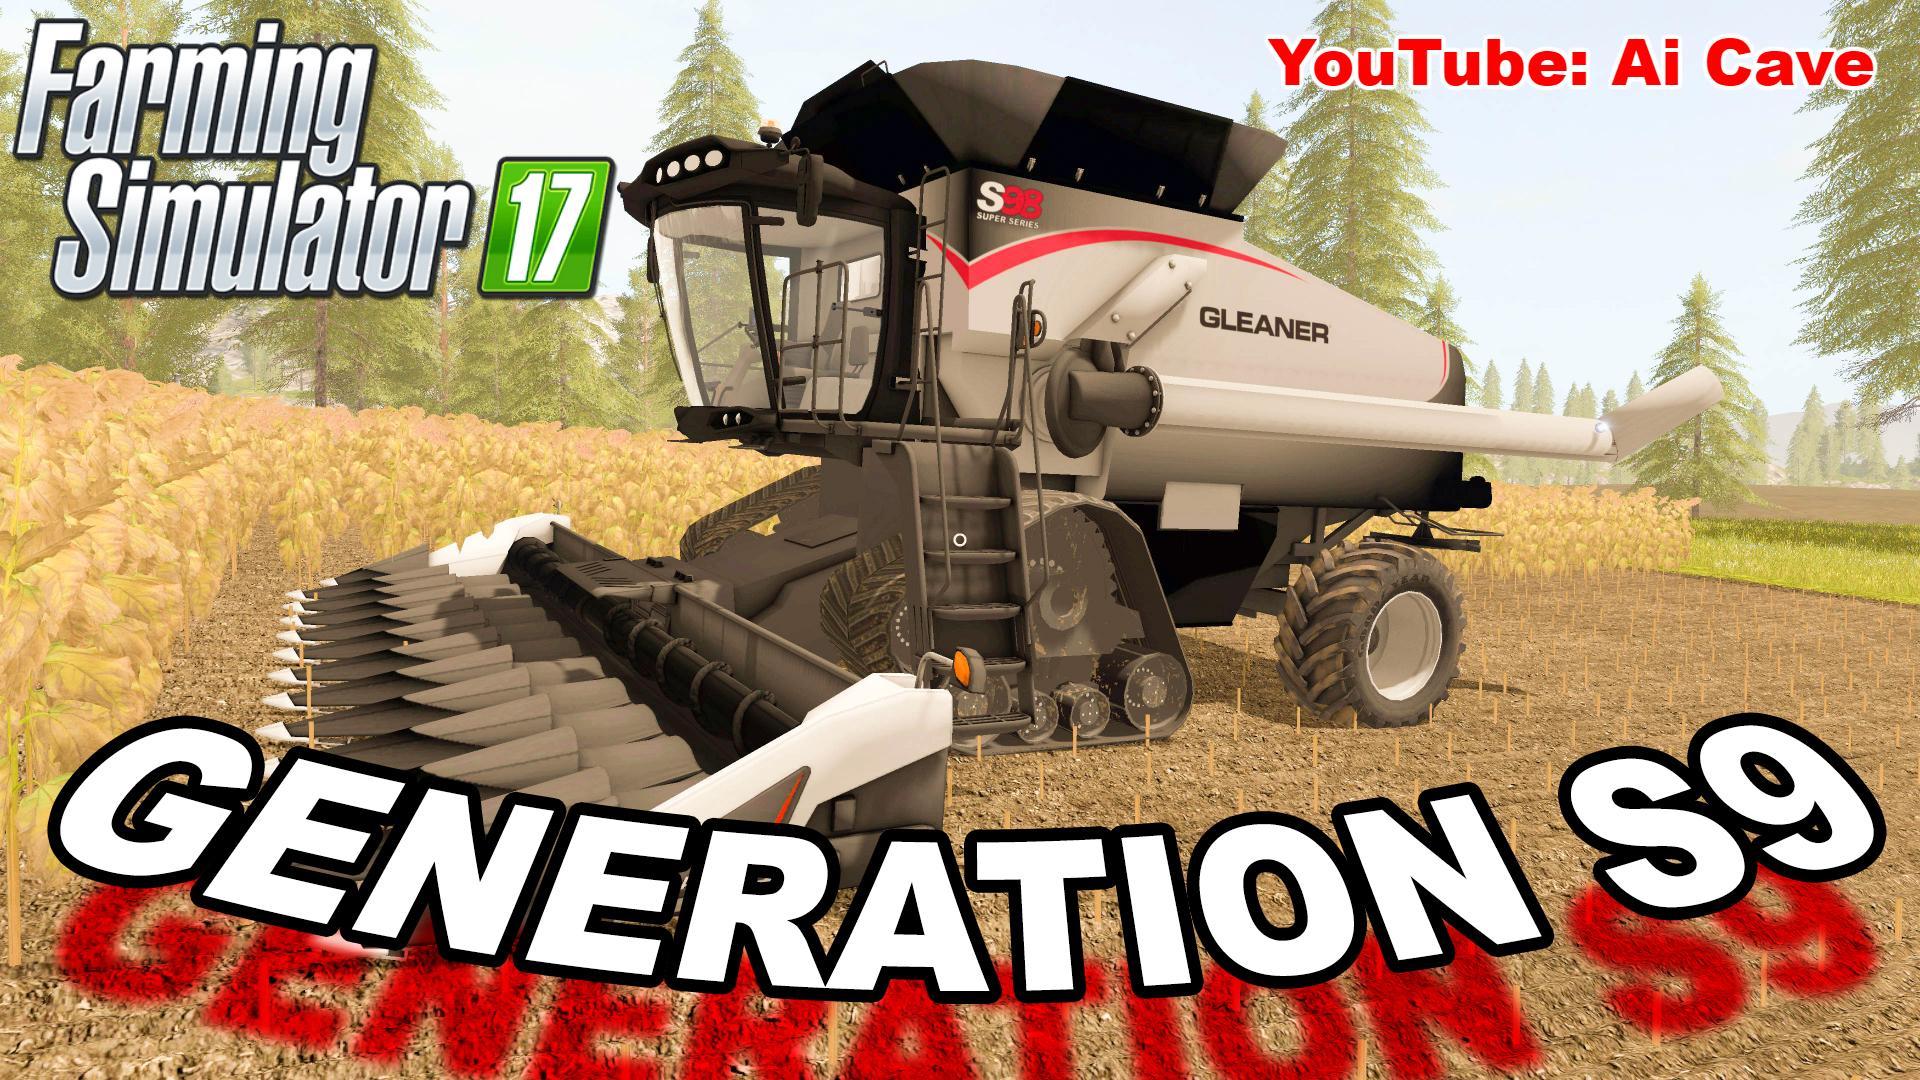 GENERATION S9 SUPER SERIES v2.0